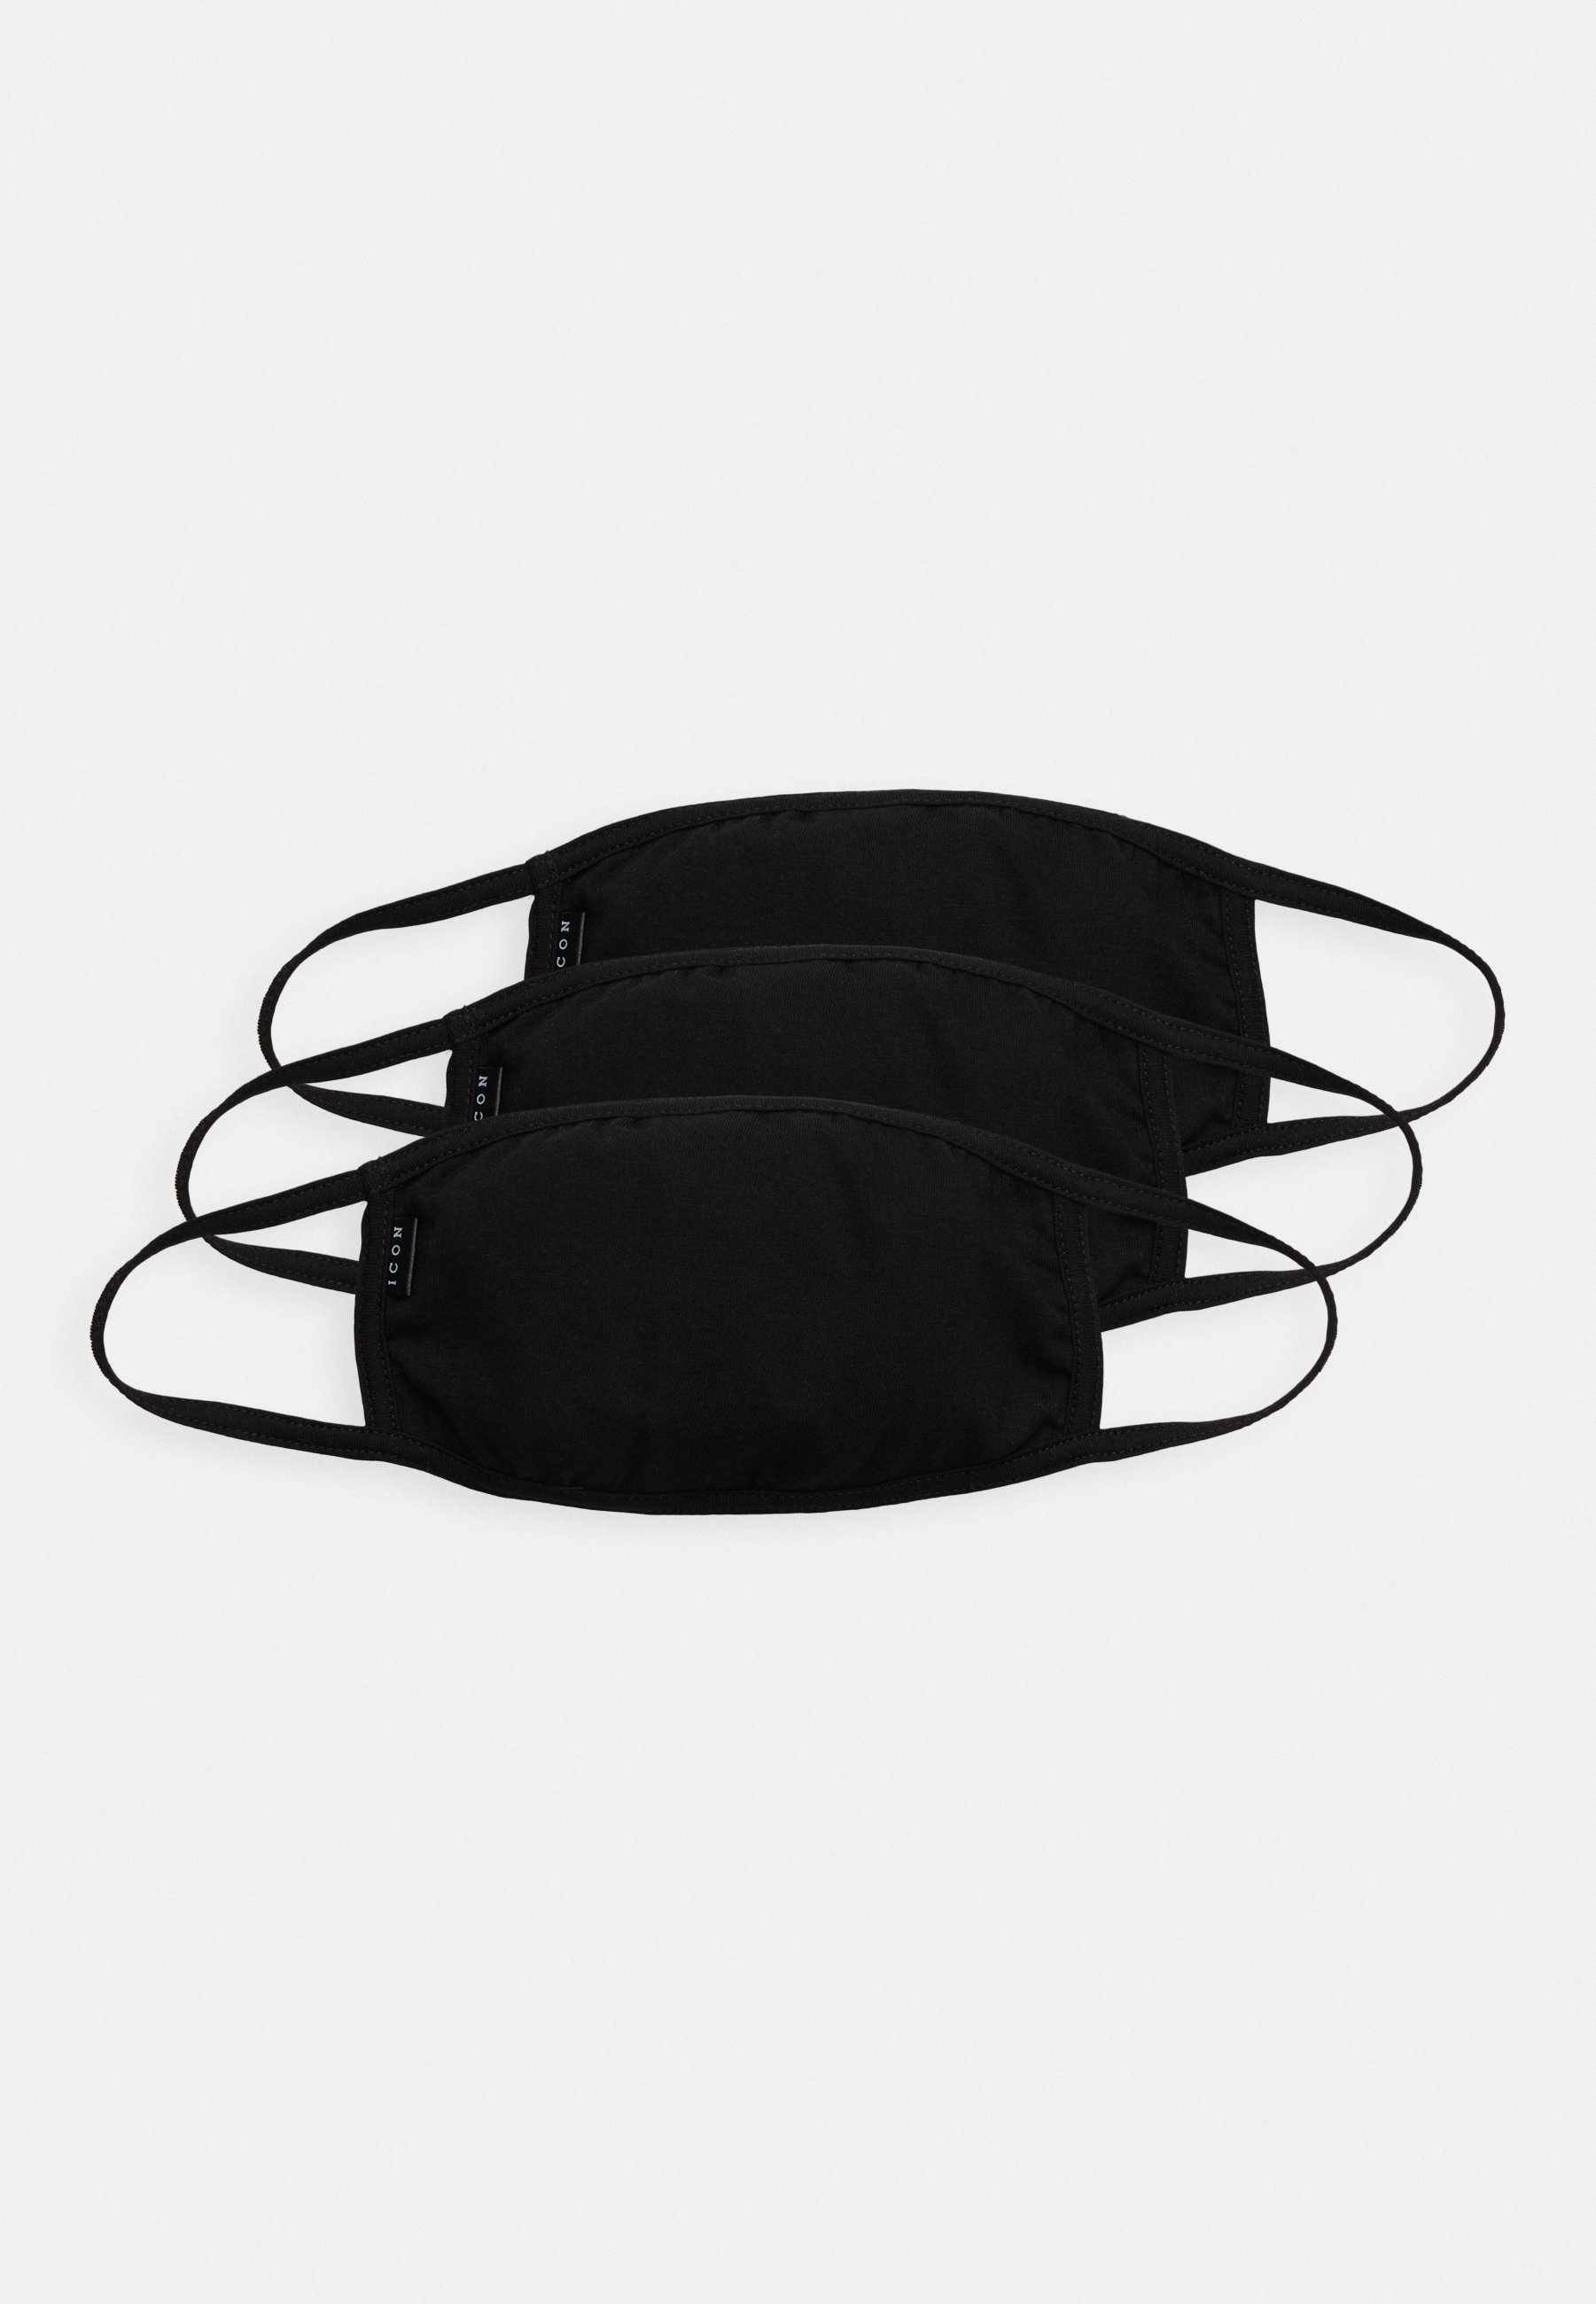 Icon Brand COMMUNITY MASK 3 PACK - Munnbind i tøy - black/svart CGm7pIx94cqwE8c